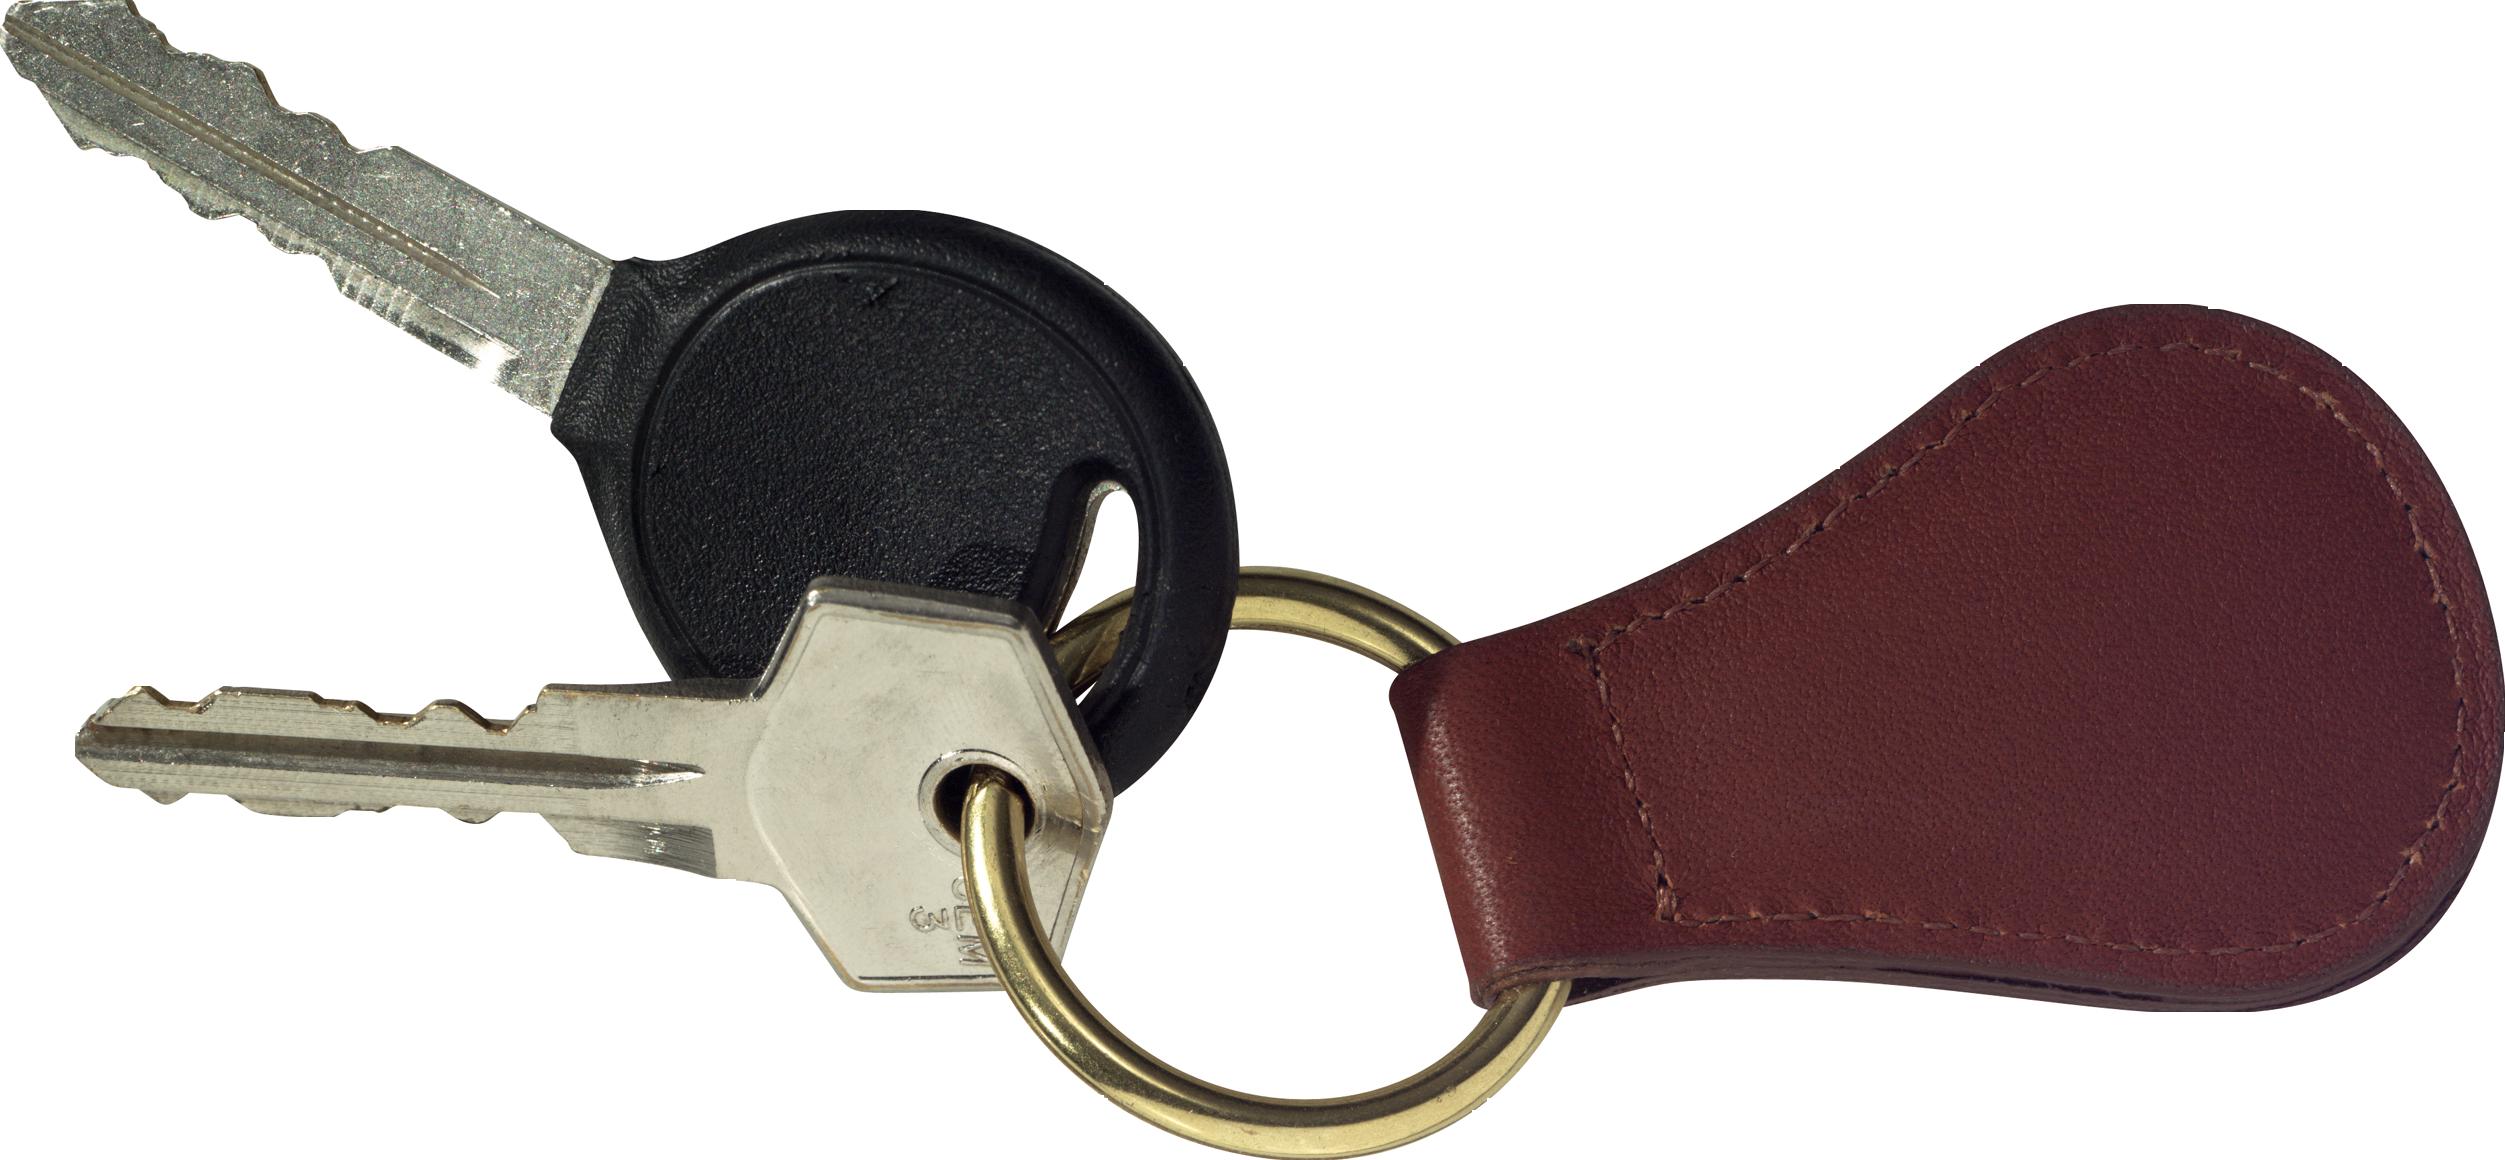 Thirteen isolated stock photo. Keys clipart key concept